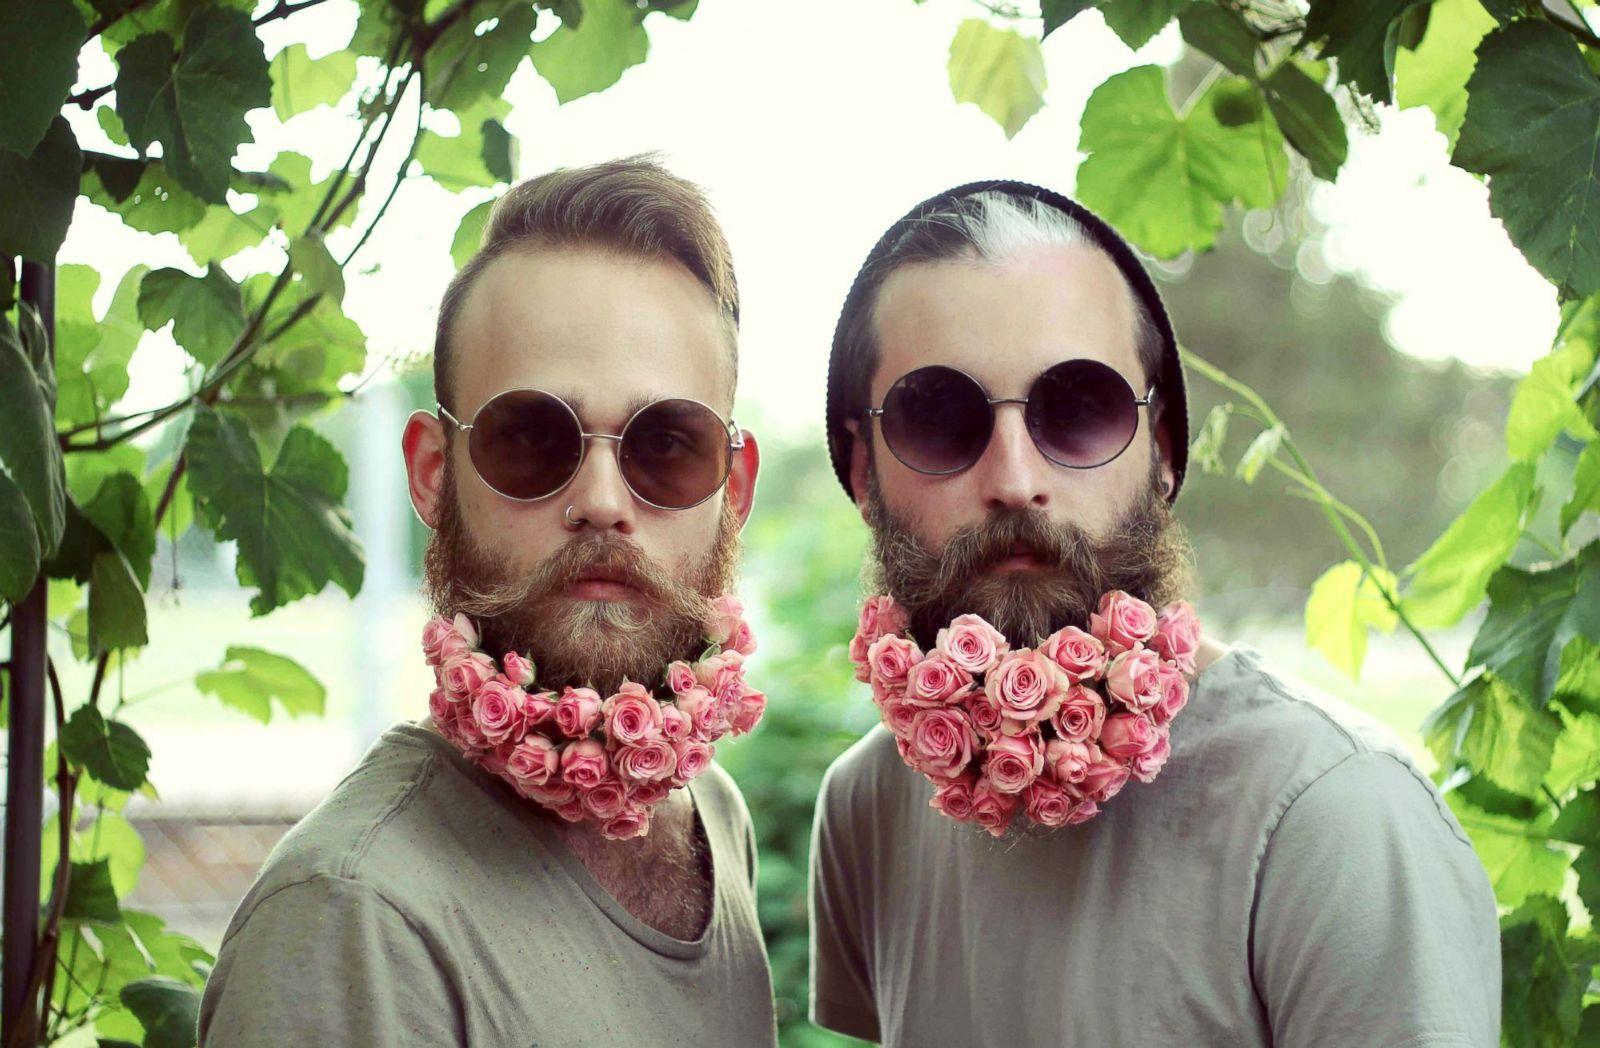 extreme beard grooming photos image 1 abc news. Black Bedroom Furniture Sets. Home Design Ideas